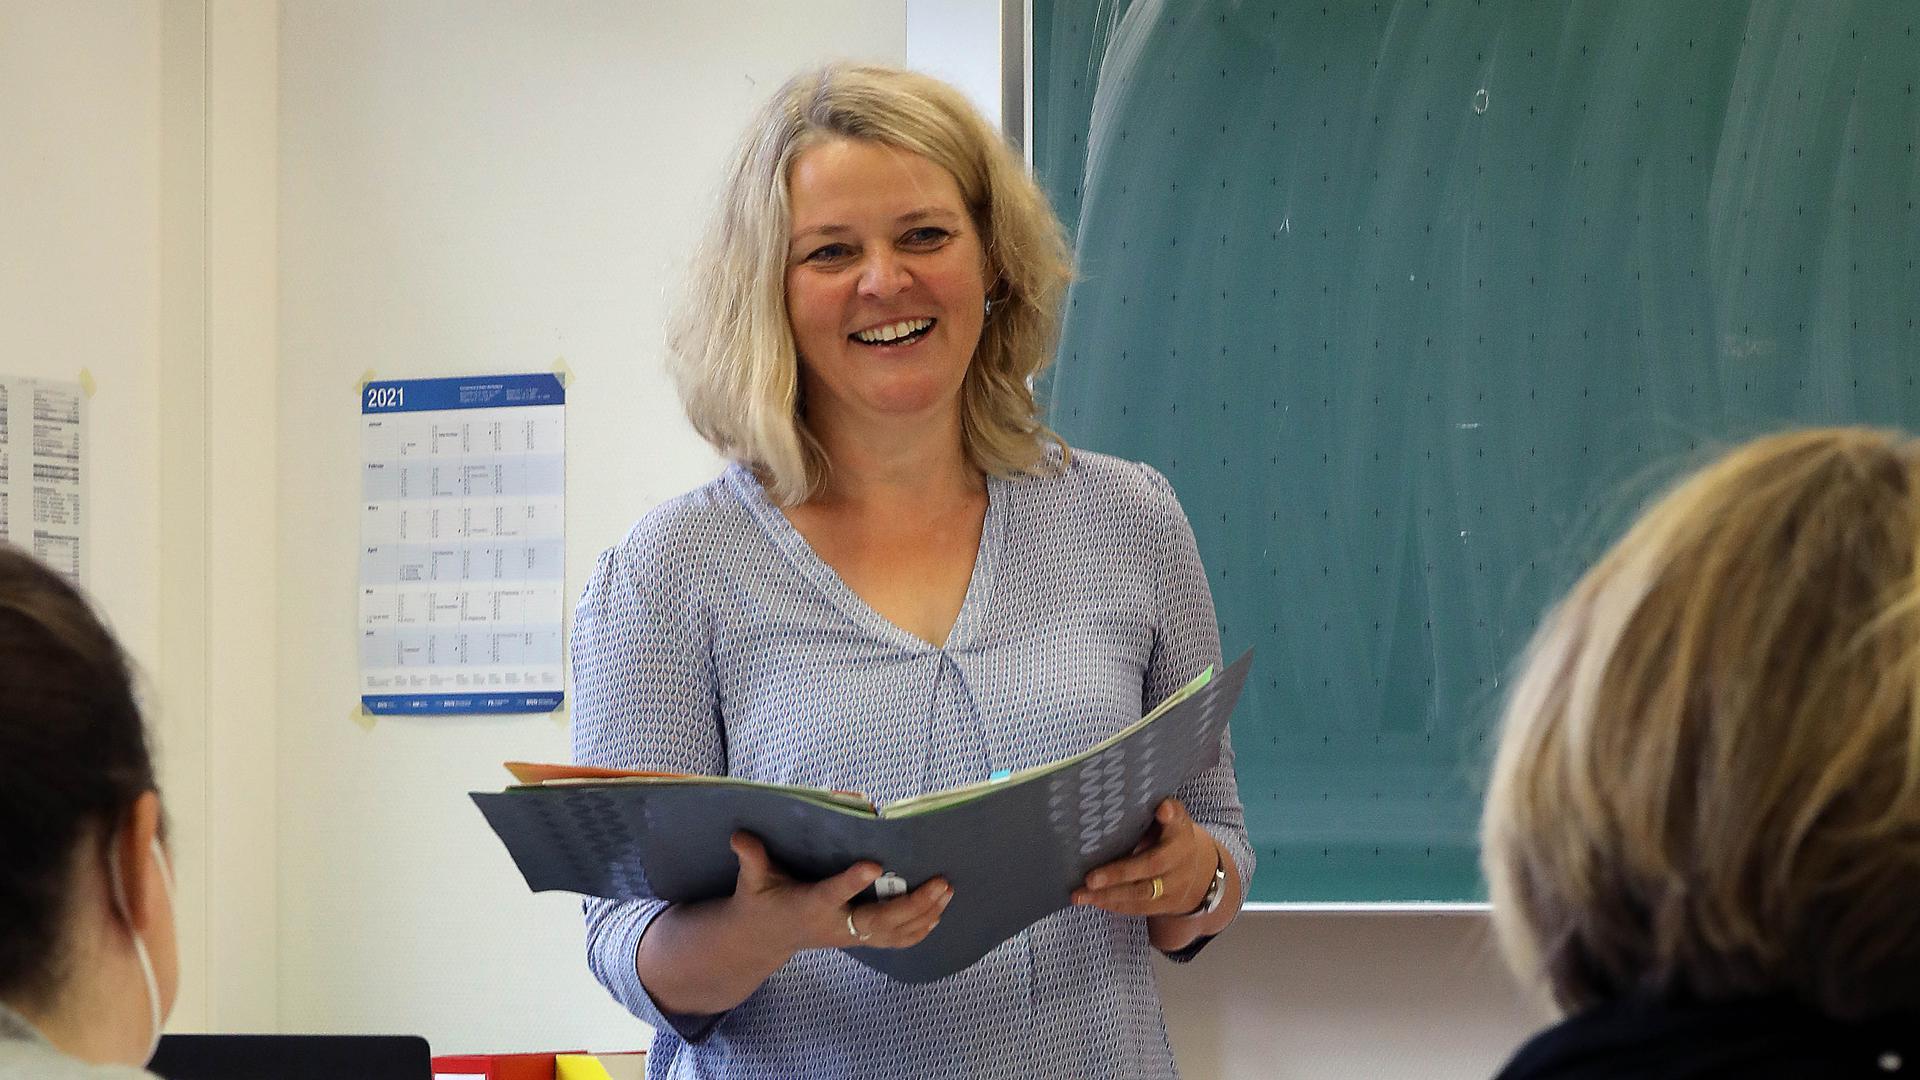 Astrid Kuwert-Oesterle